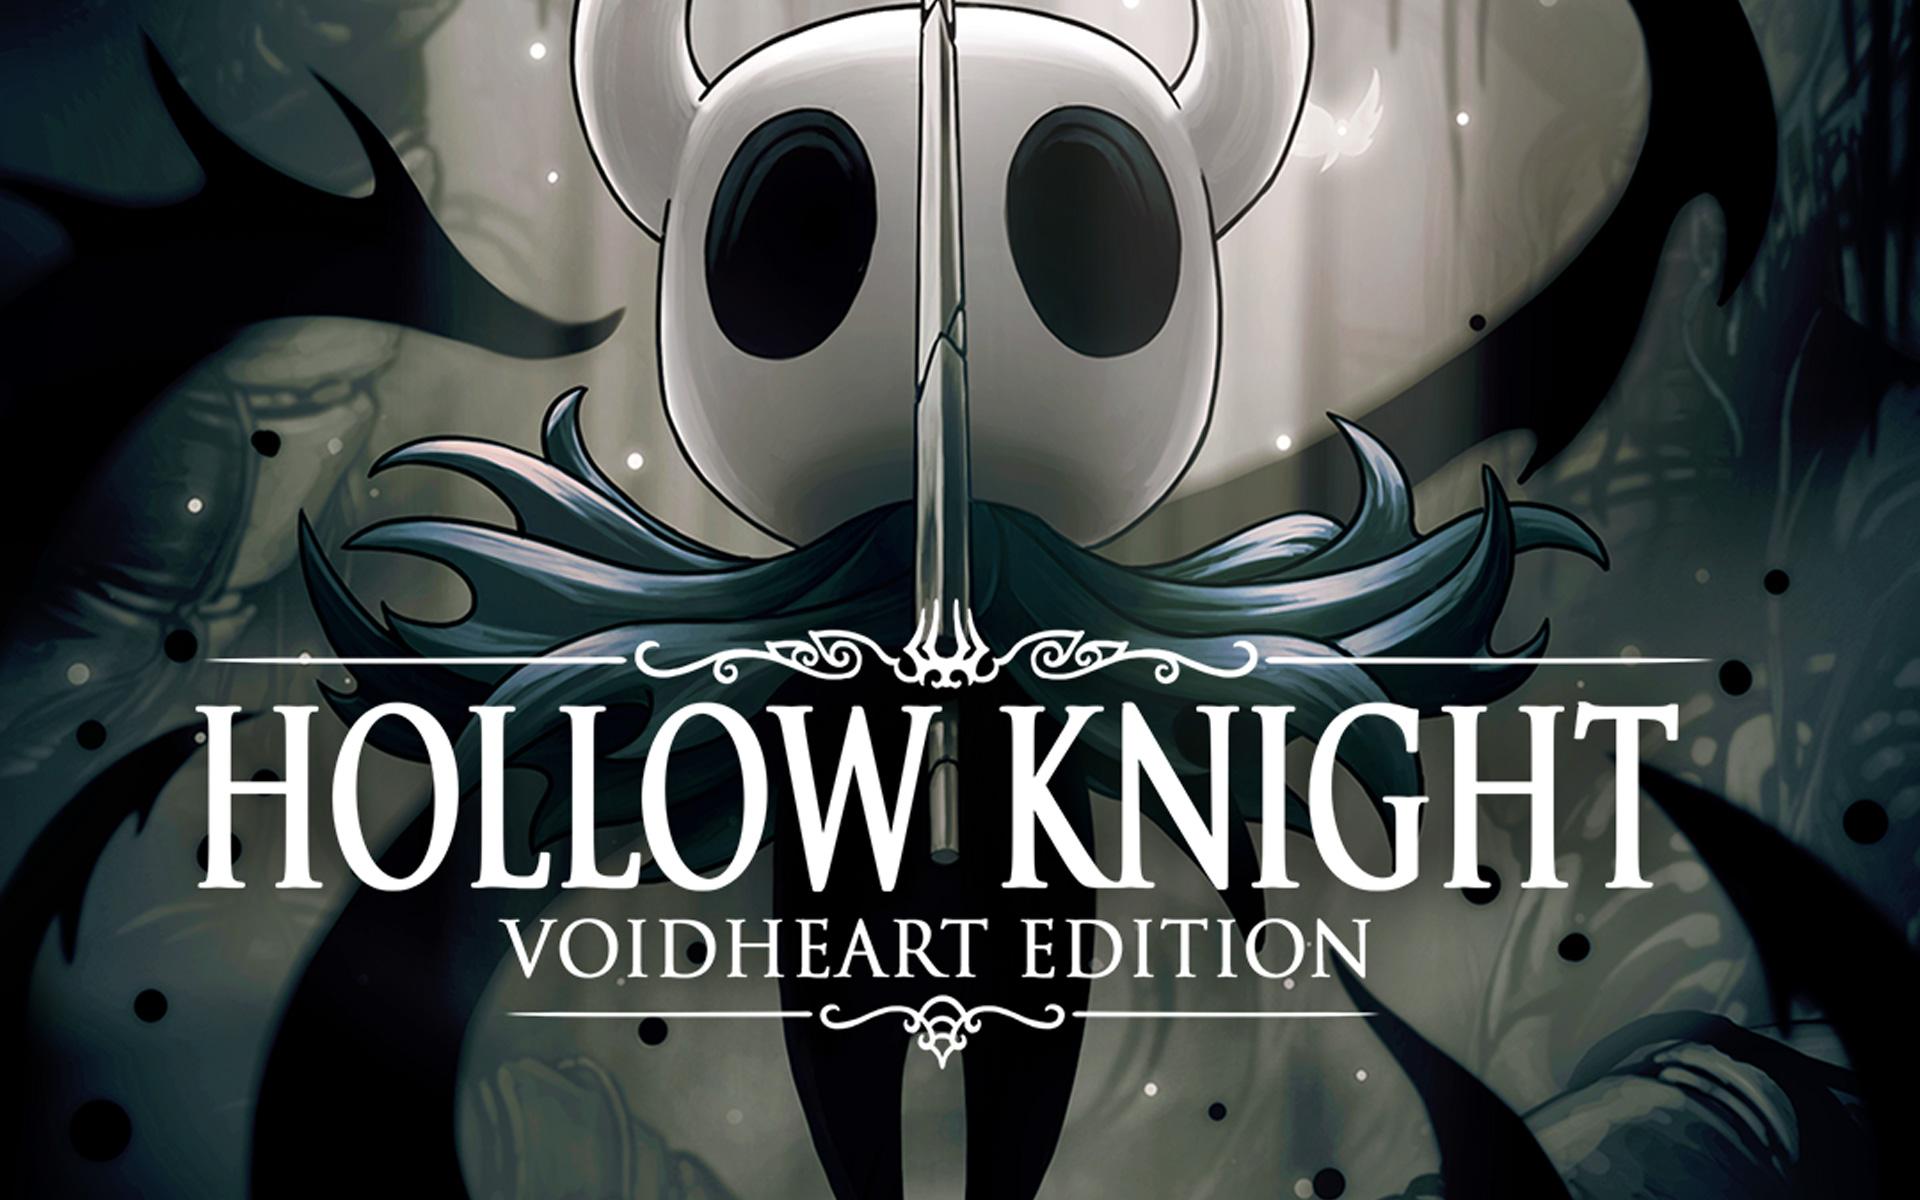 Hollow Knight Wallpaper in 1920x1200